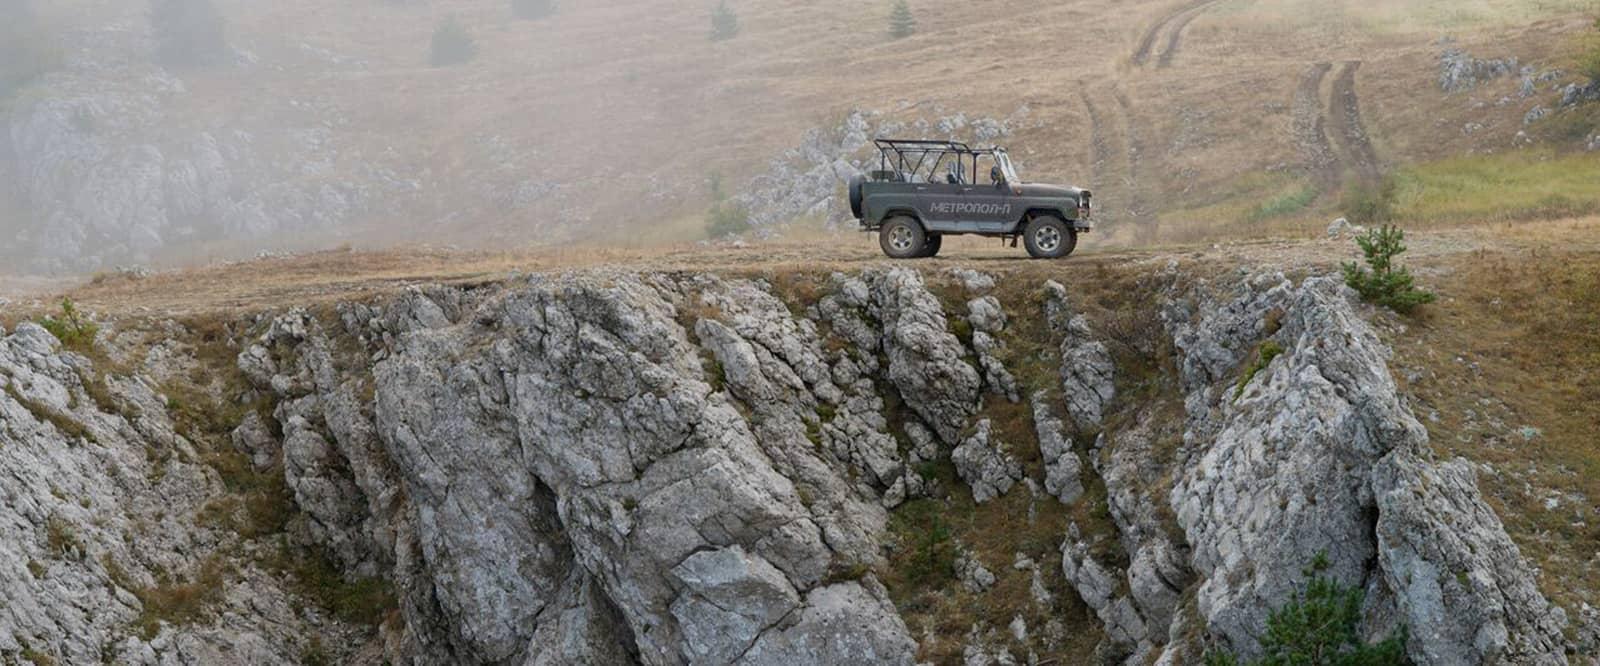 Авточасти за руски автомобили и камиони